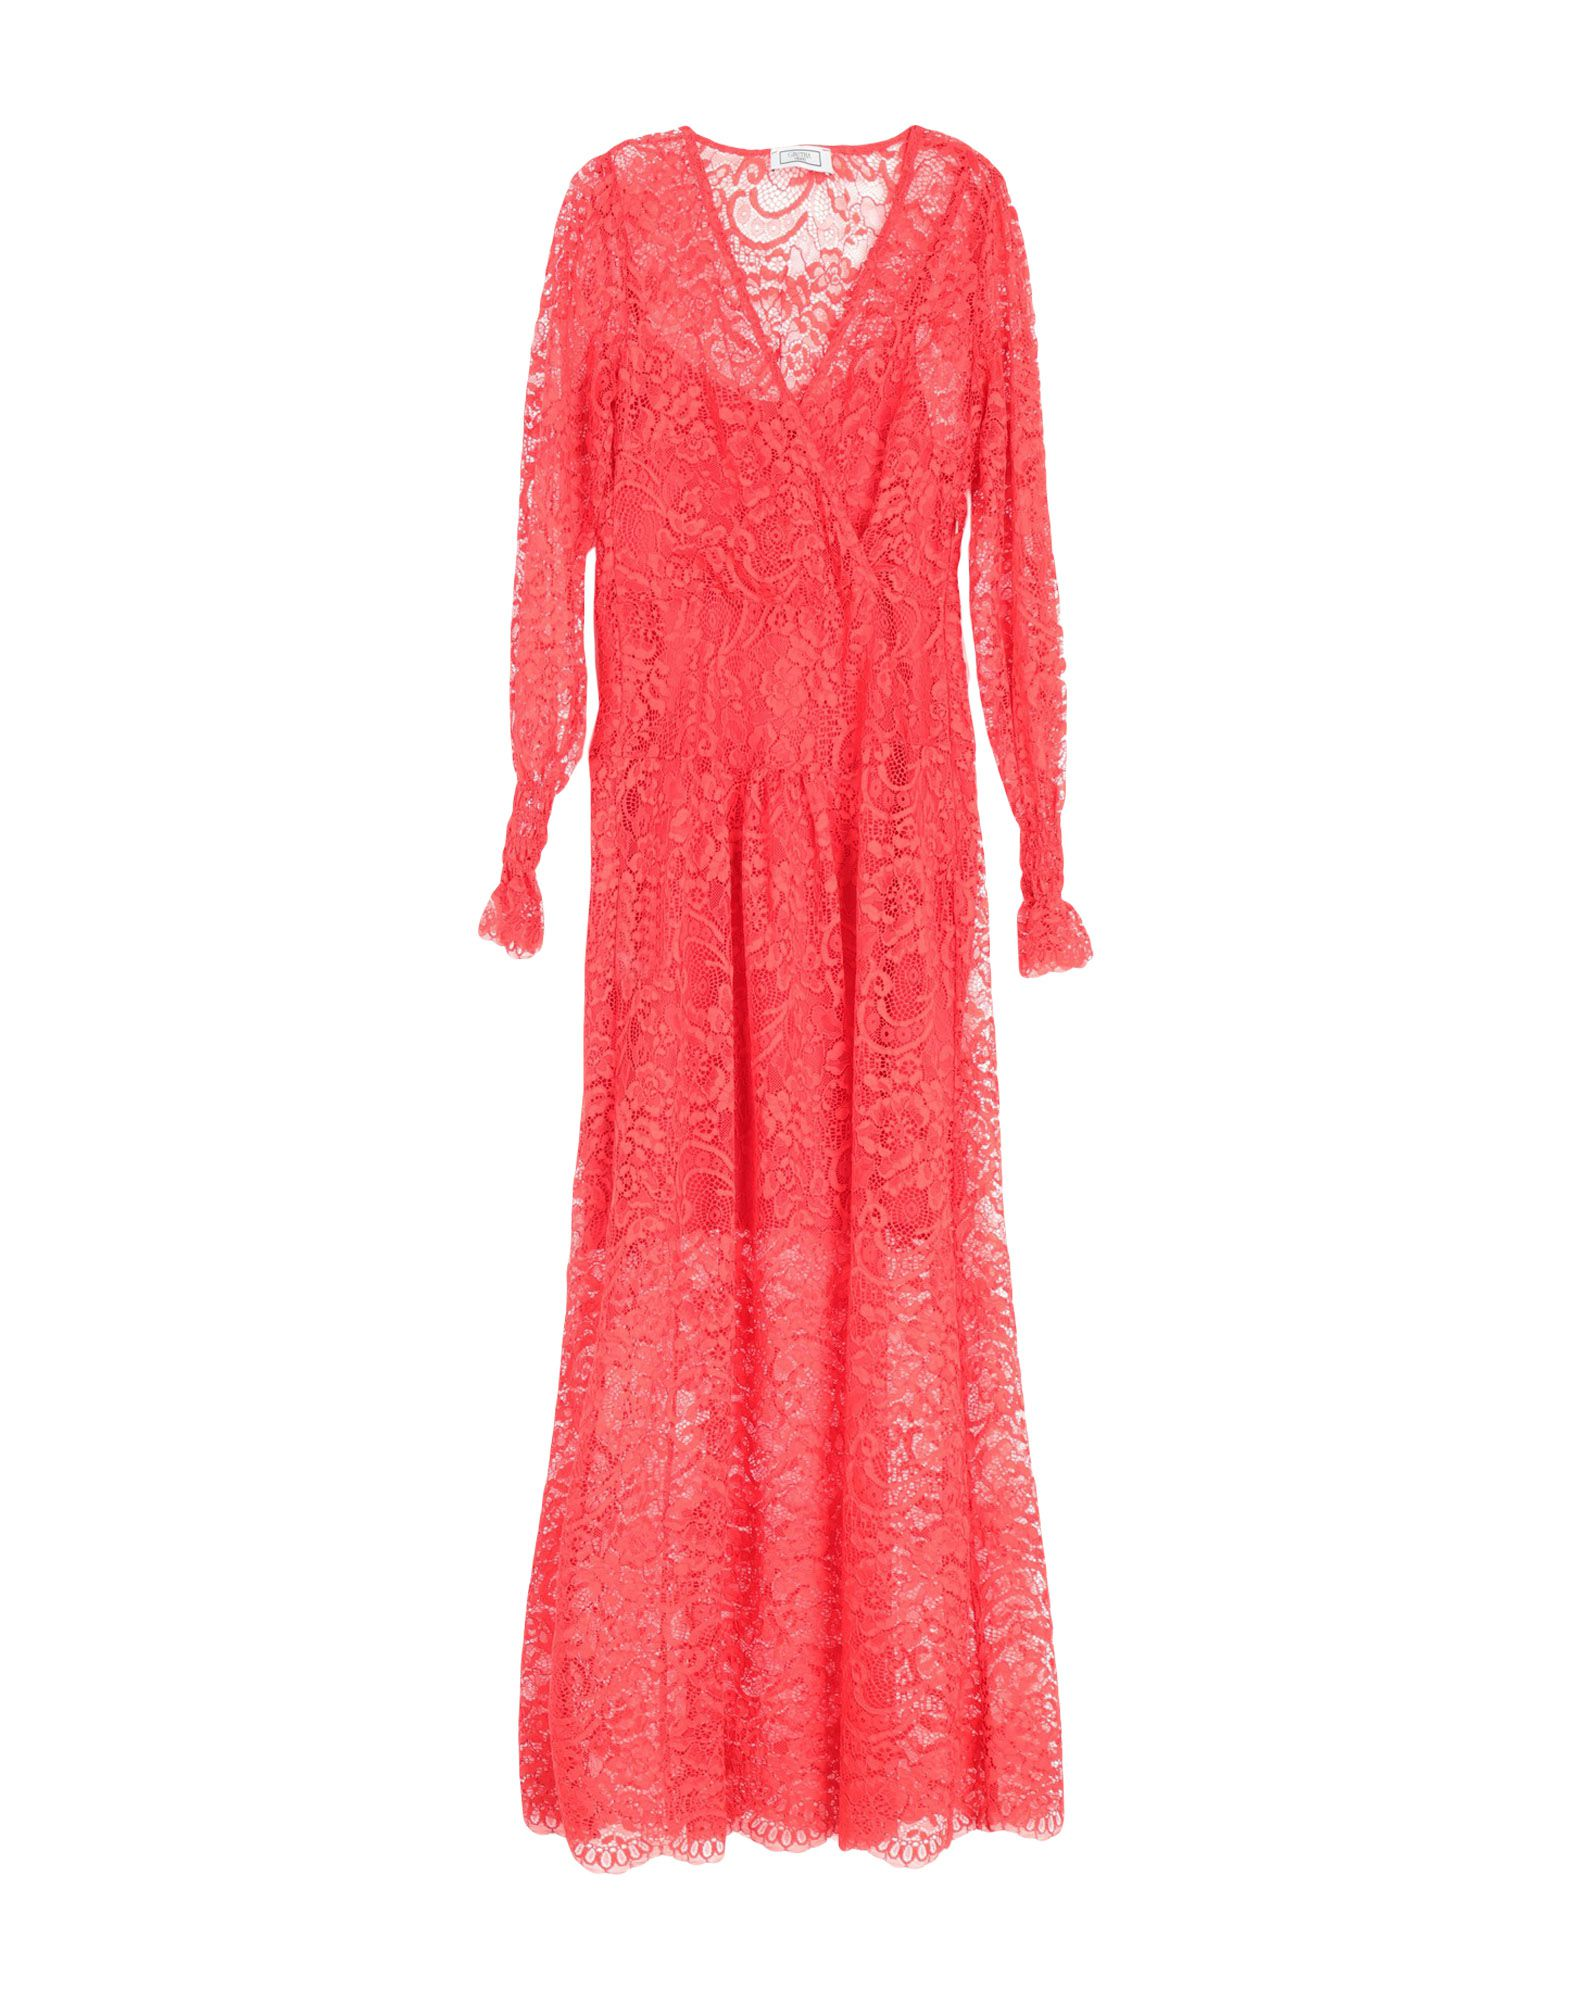 gretha milano блузка GRETHA Milano Длинное платье